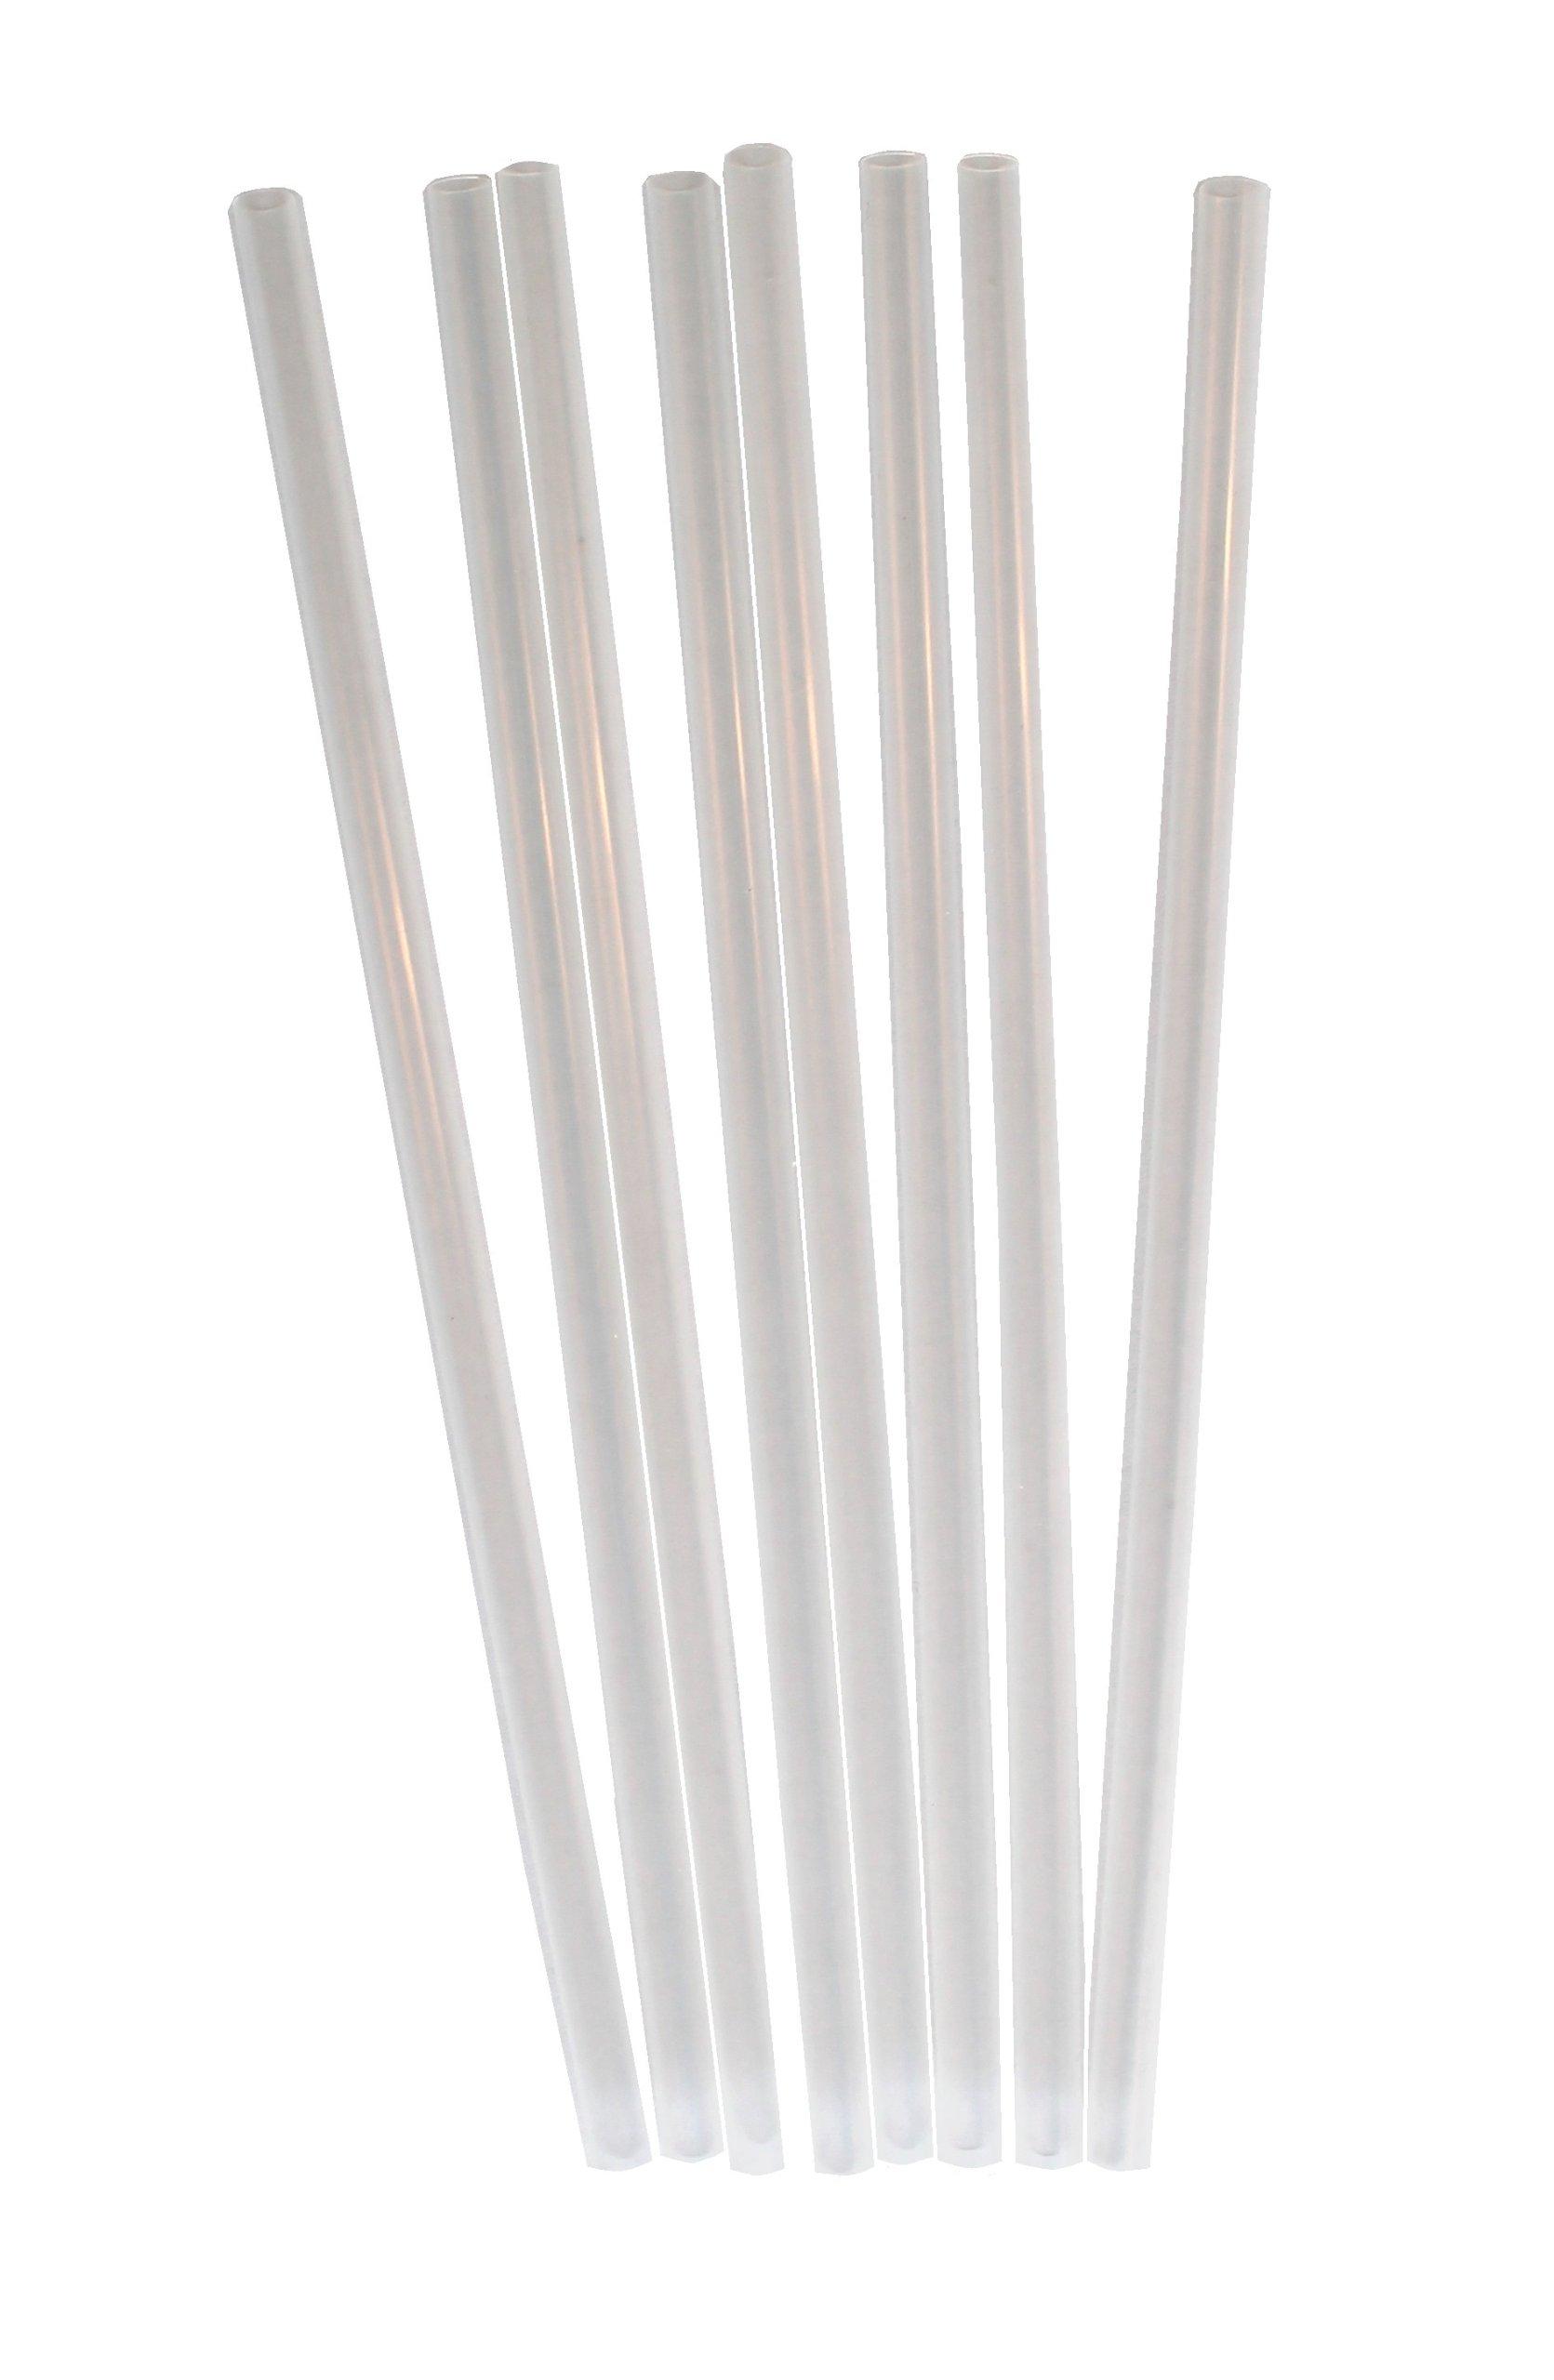 "Daxwell Plastic Straws, Clear, Wrapped, 7.75"" x 6 mm, C10001570B (Box of 500)"